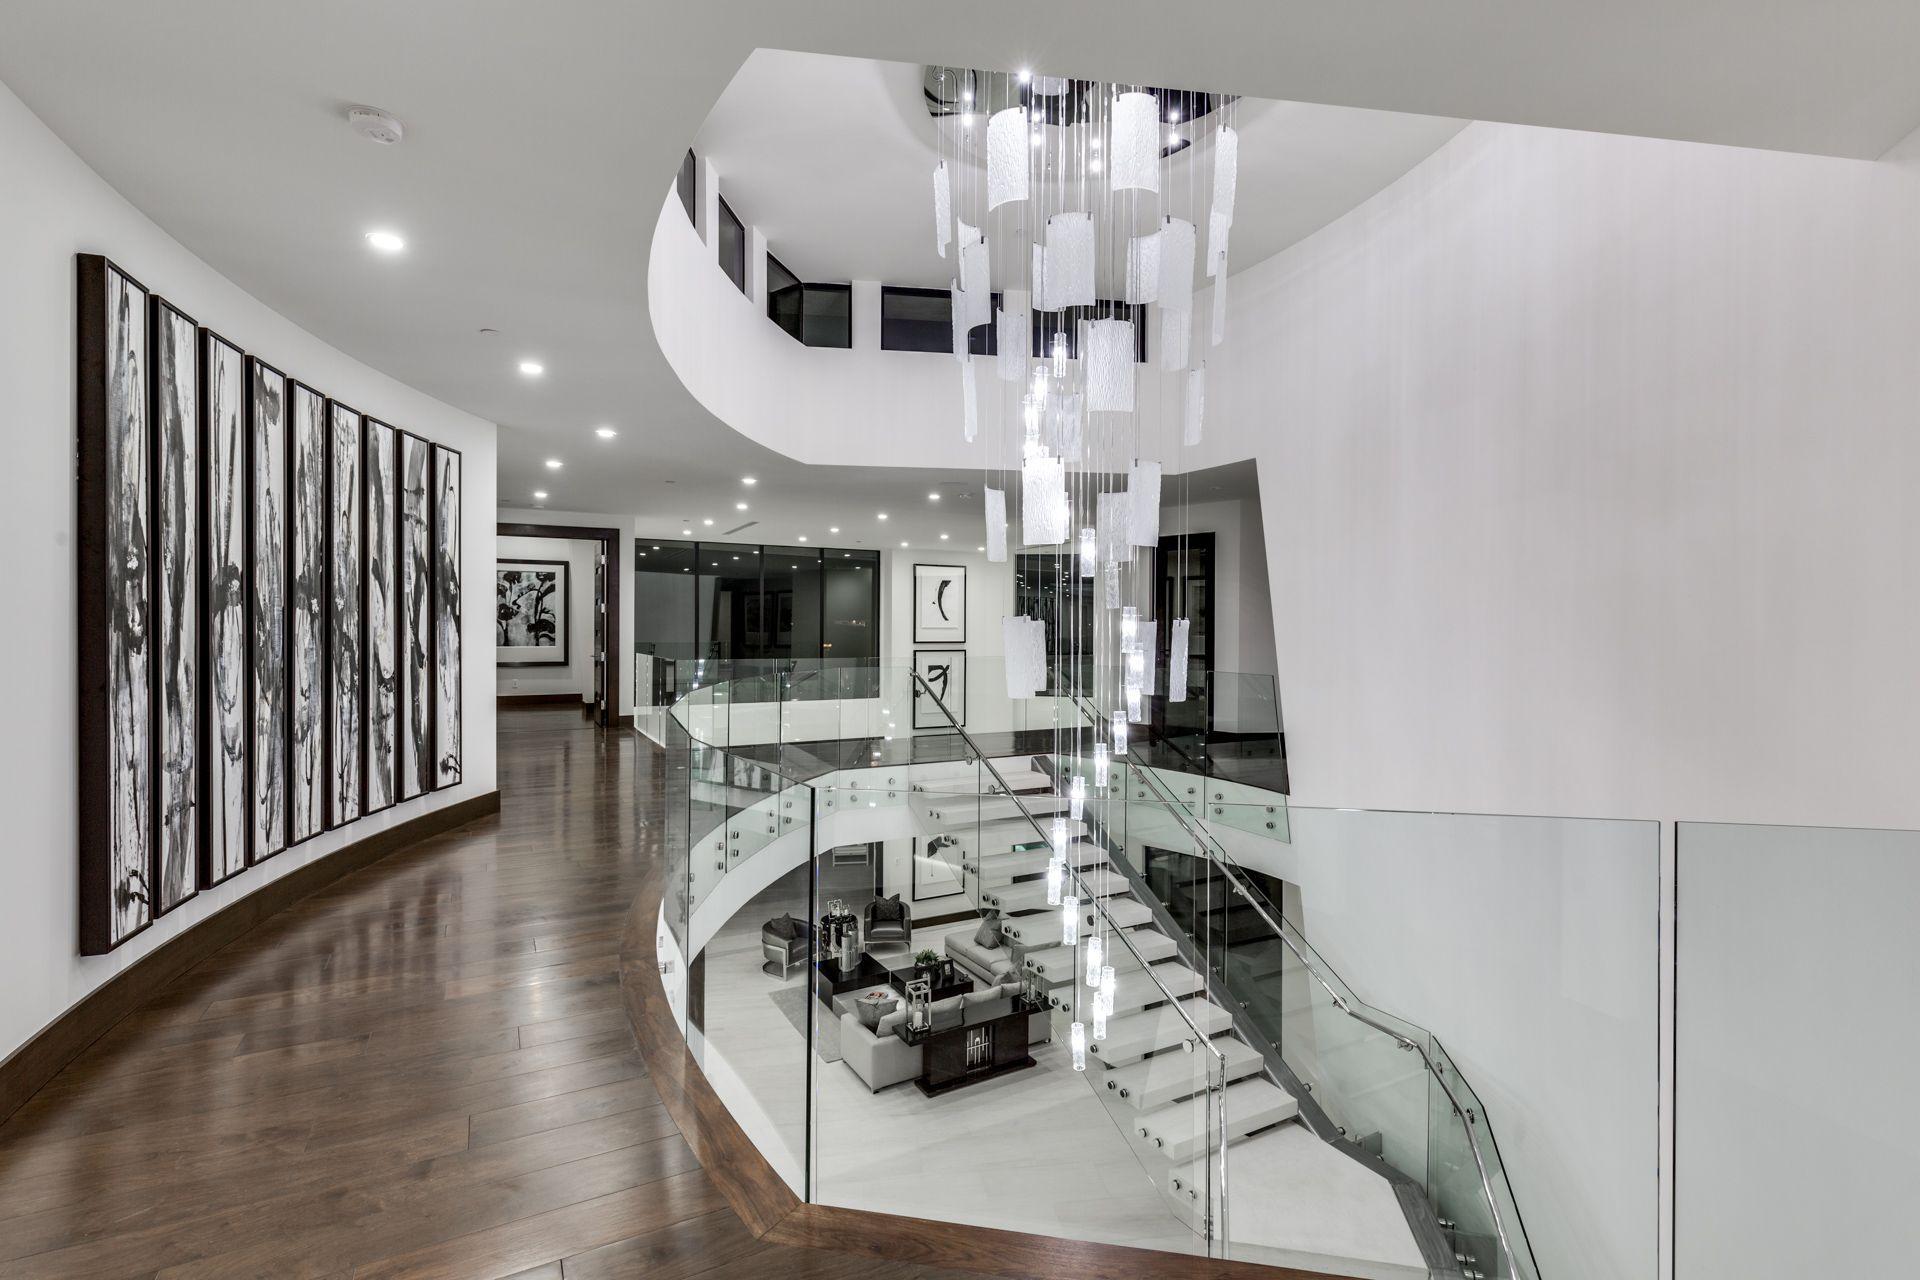 Luxury Design At Its Finest Interiordesign Luxuryinteriordesign Staircase Luxuryinteriordesign Man Luxury Design Luxury Interior Design Luxury Interior